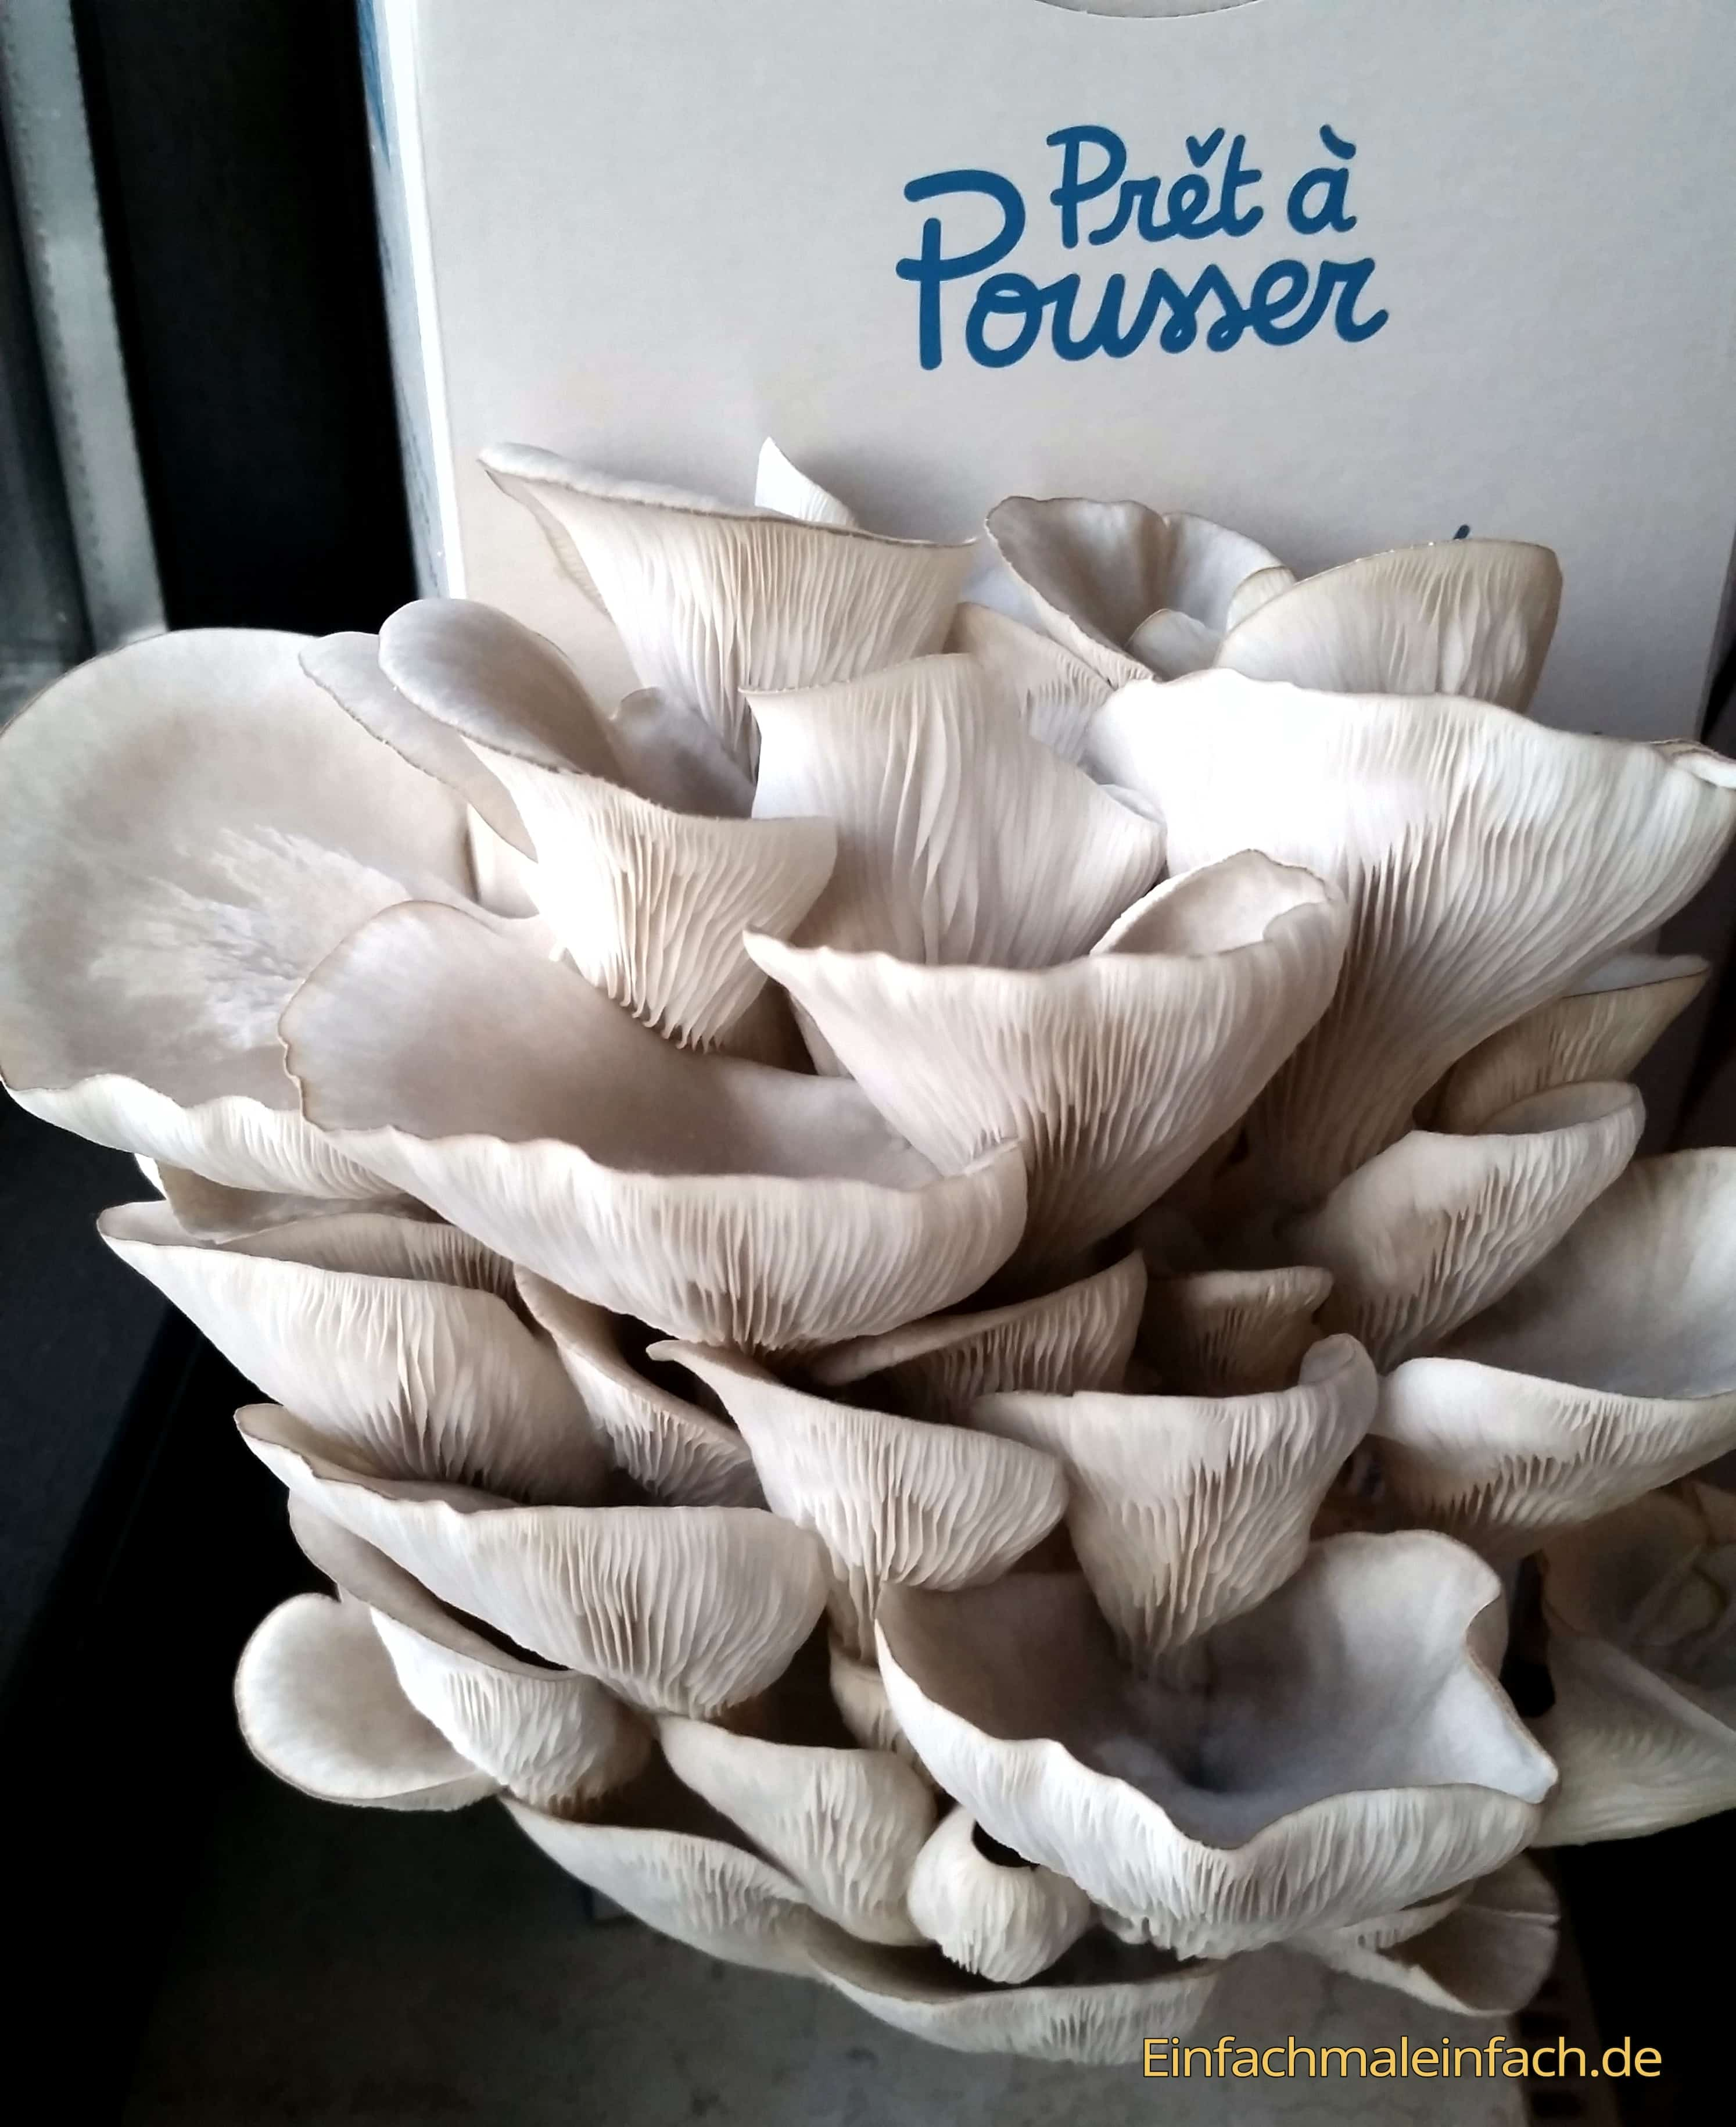 Pilzsoßenbasis-Pilzsuppe-einfach-selbstgemacht-Austerseitlinge-13